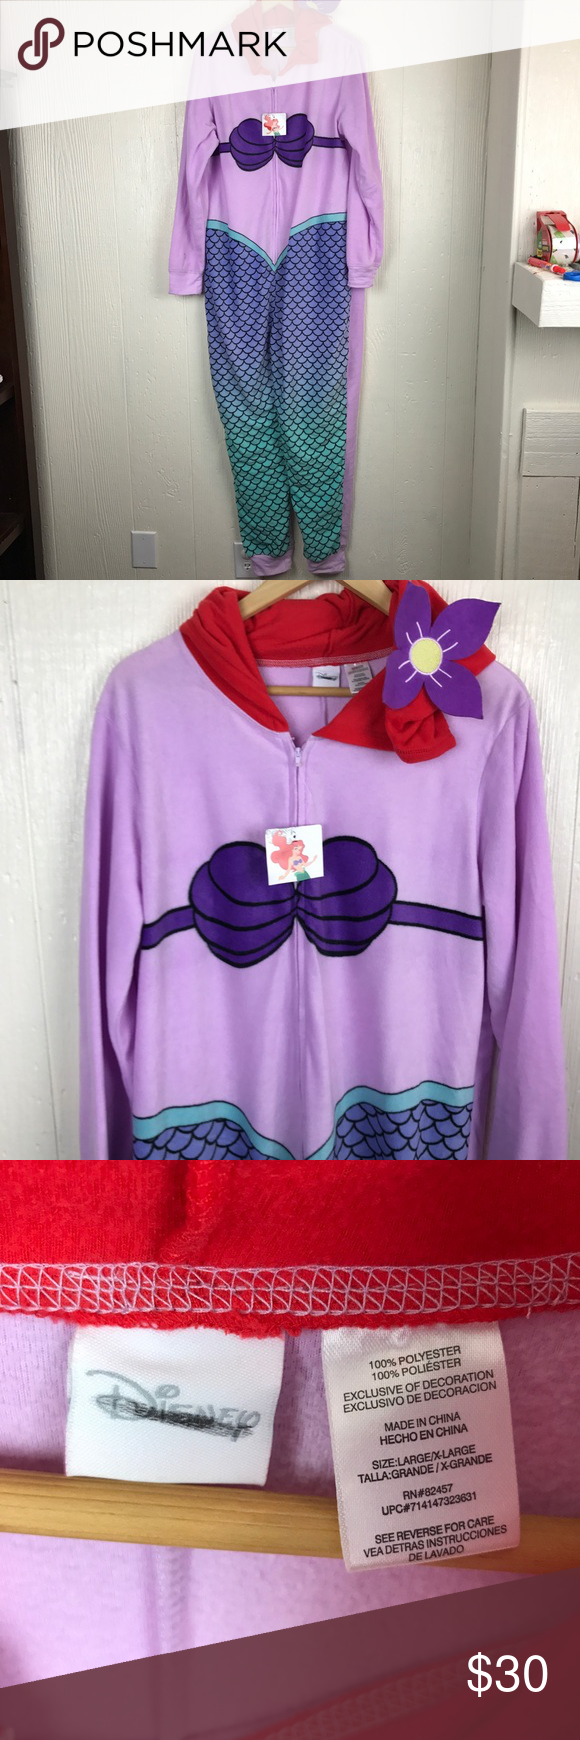 f301630e6b2 Disney Little Mermaid Sleep Suit Pajamas XL Large Nwt pajama suit! Disney  large x